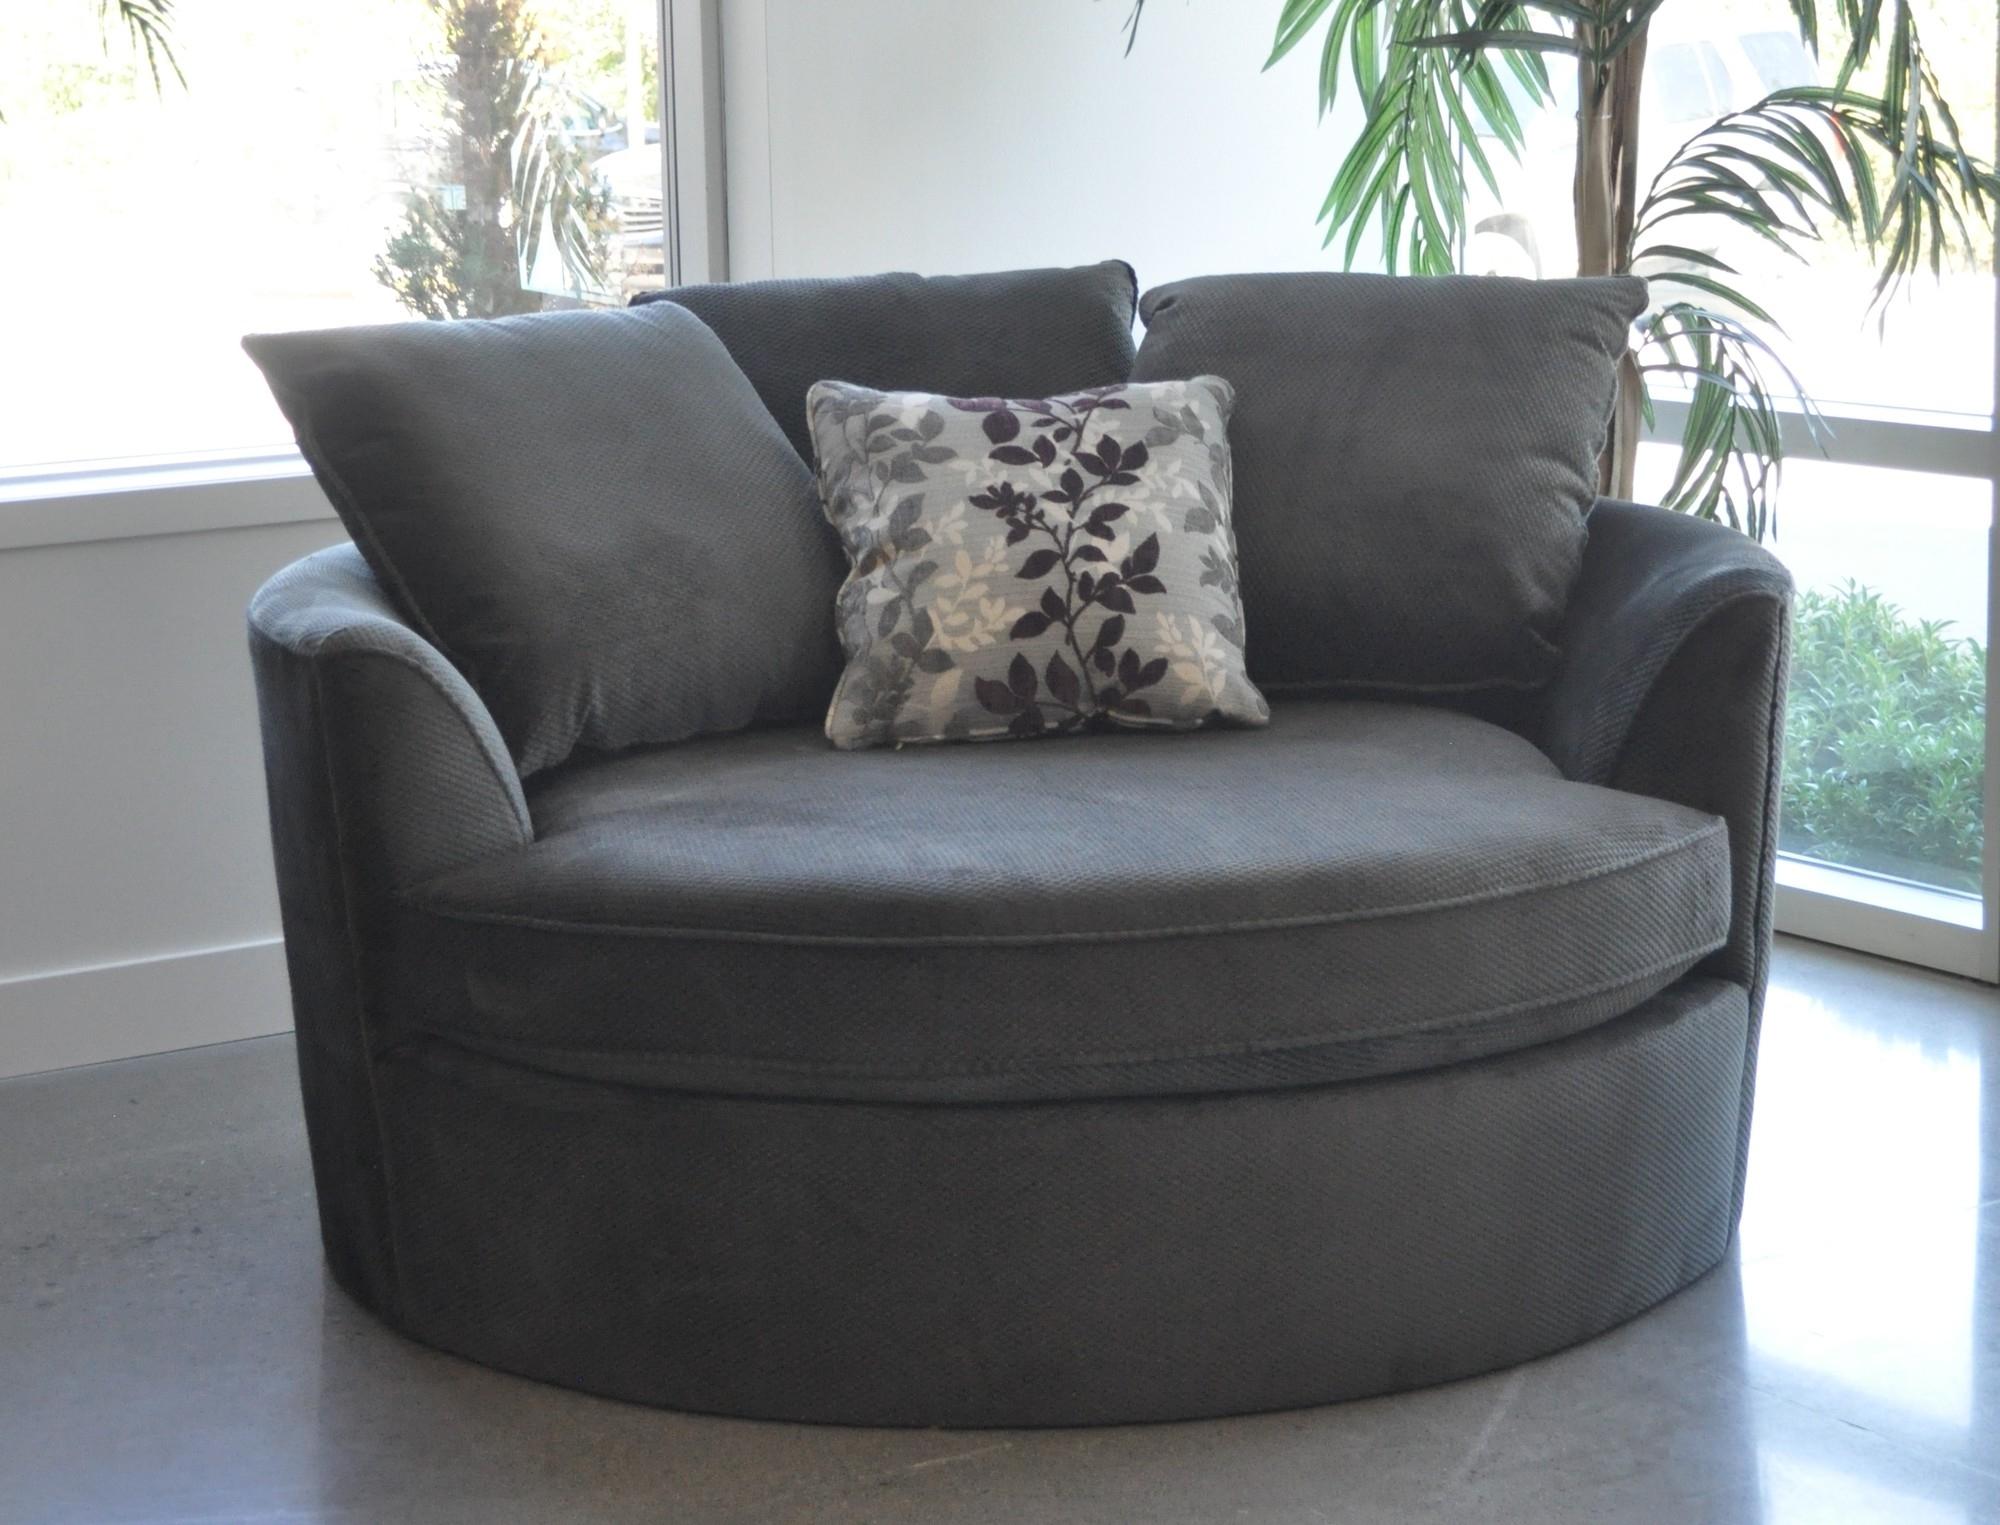 Sofa : Round Single Sofa Chair Buy Round Sofa Chair Round Sofa In Trendy Round Sofas (View 14 of 20)